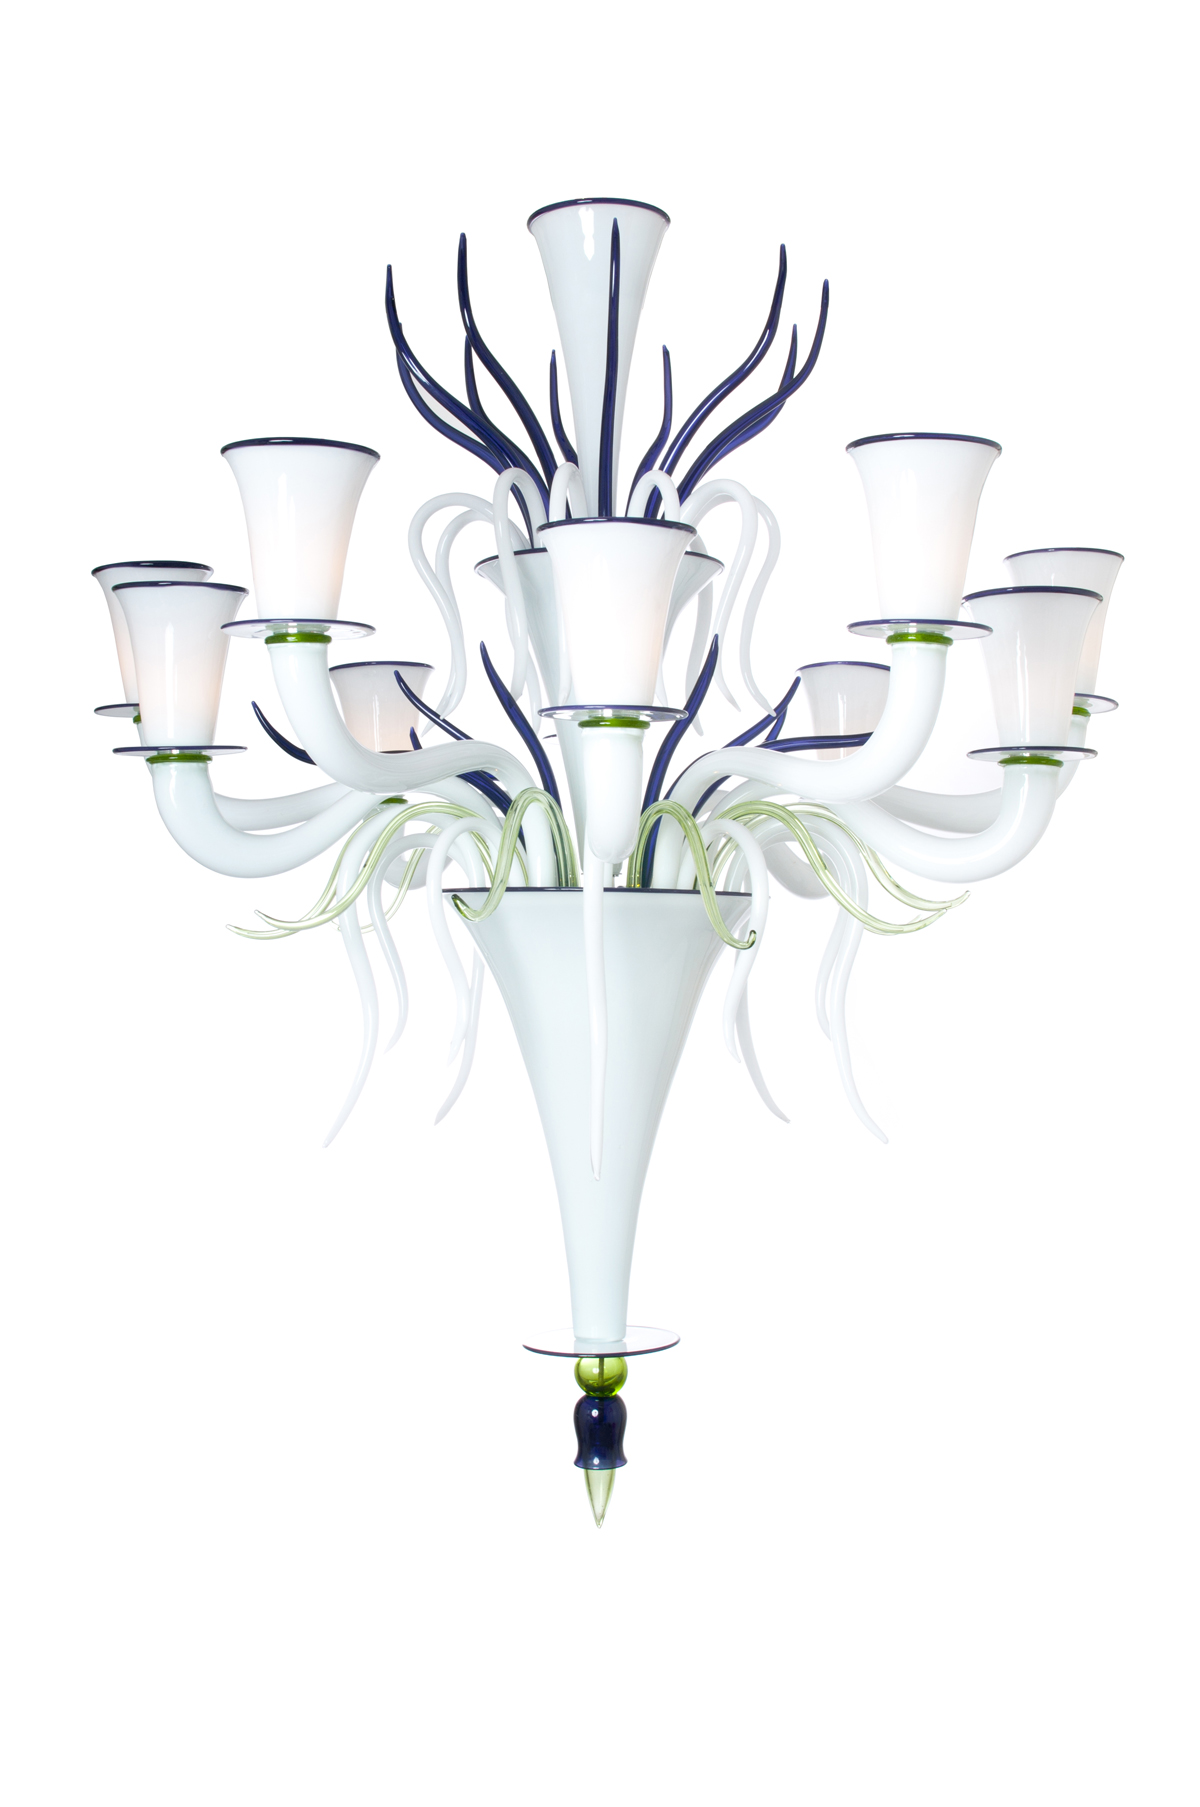 allegria-lustre-chandelier-veronese-gagnere-1.jpg